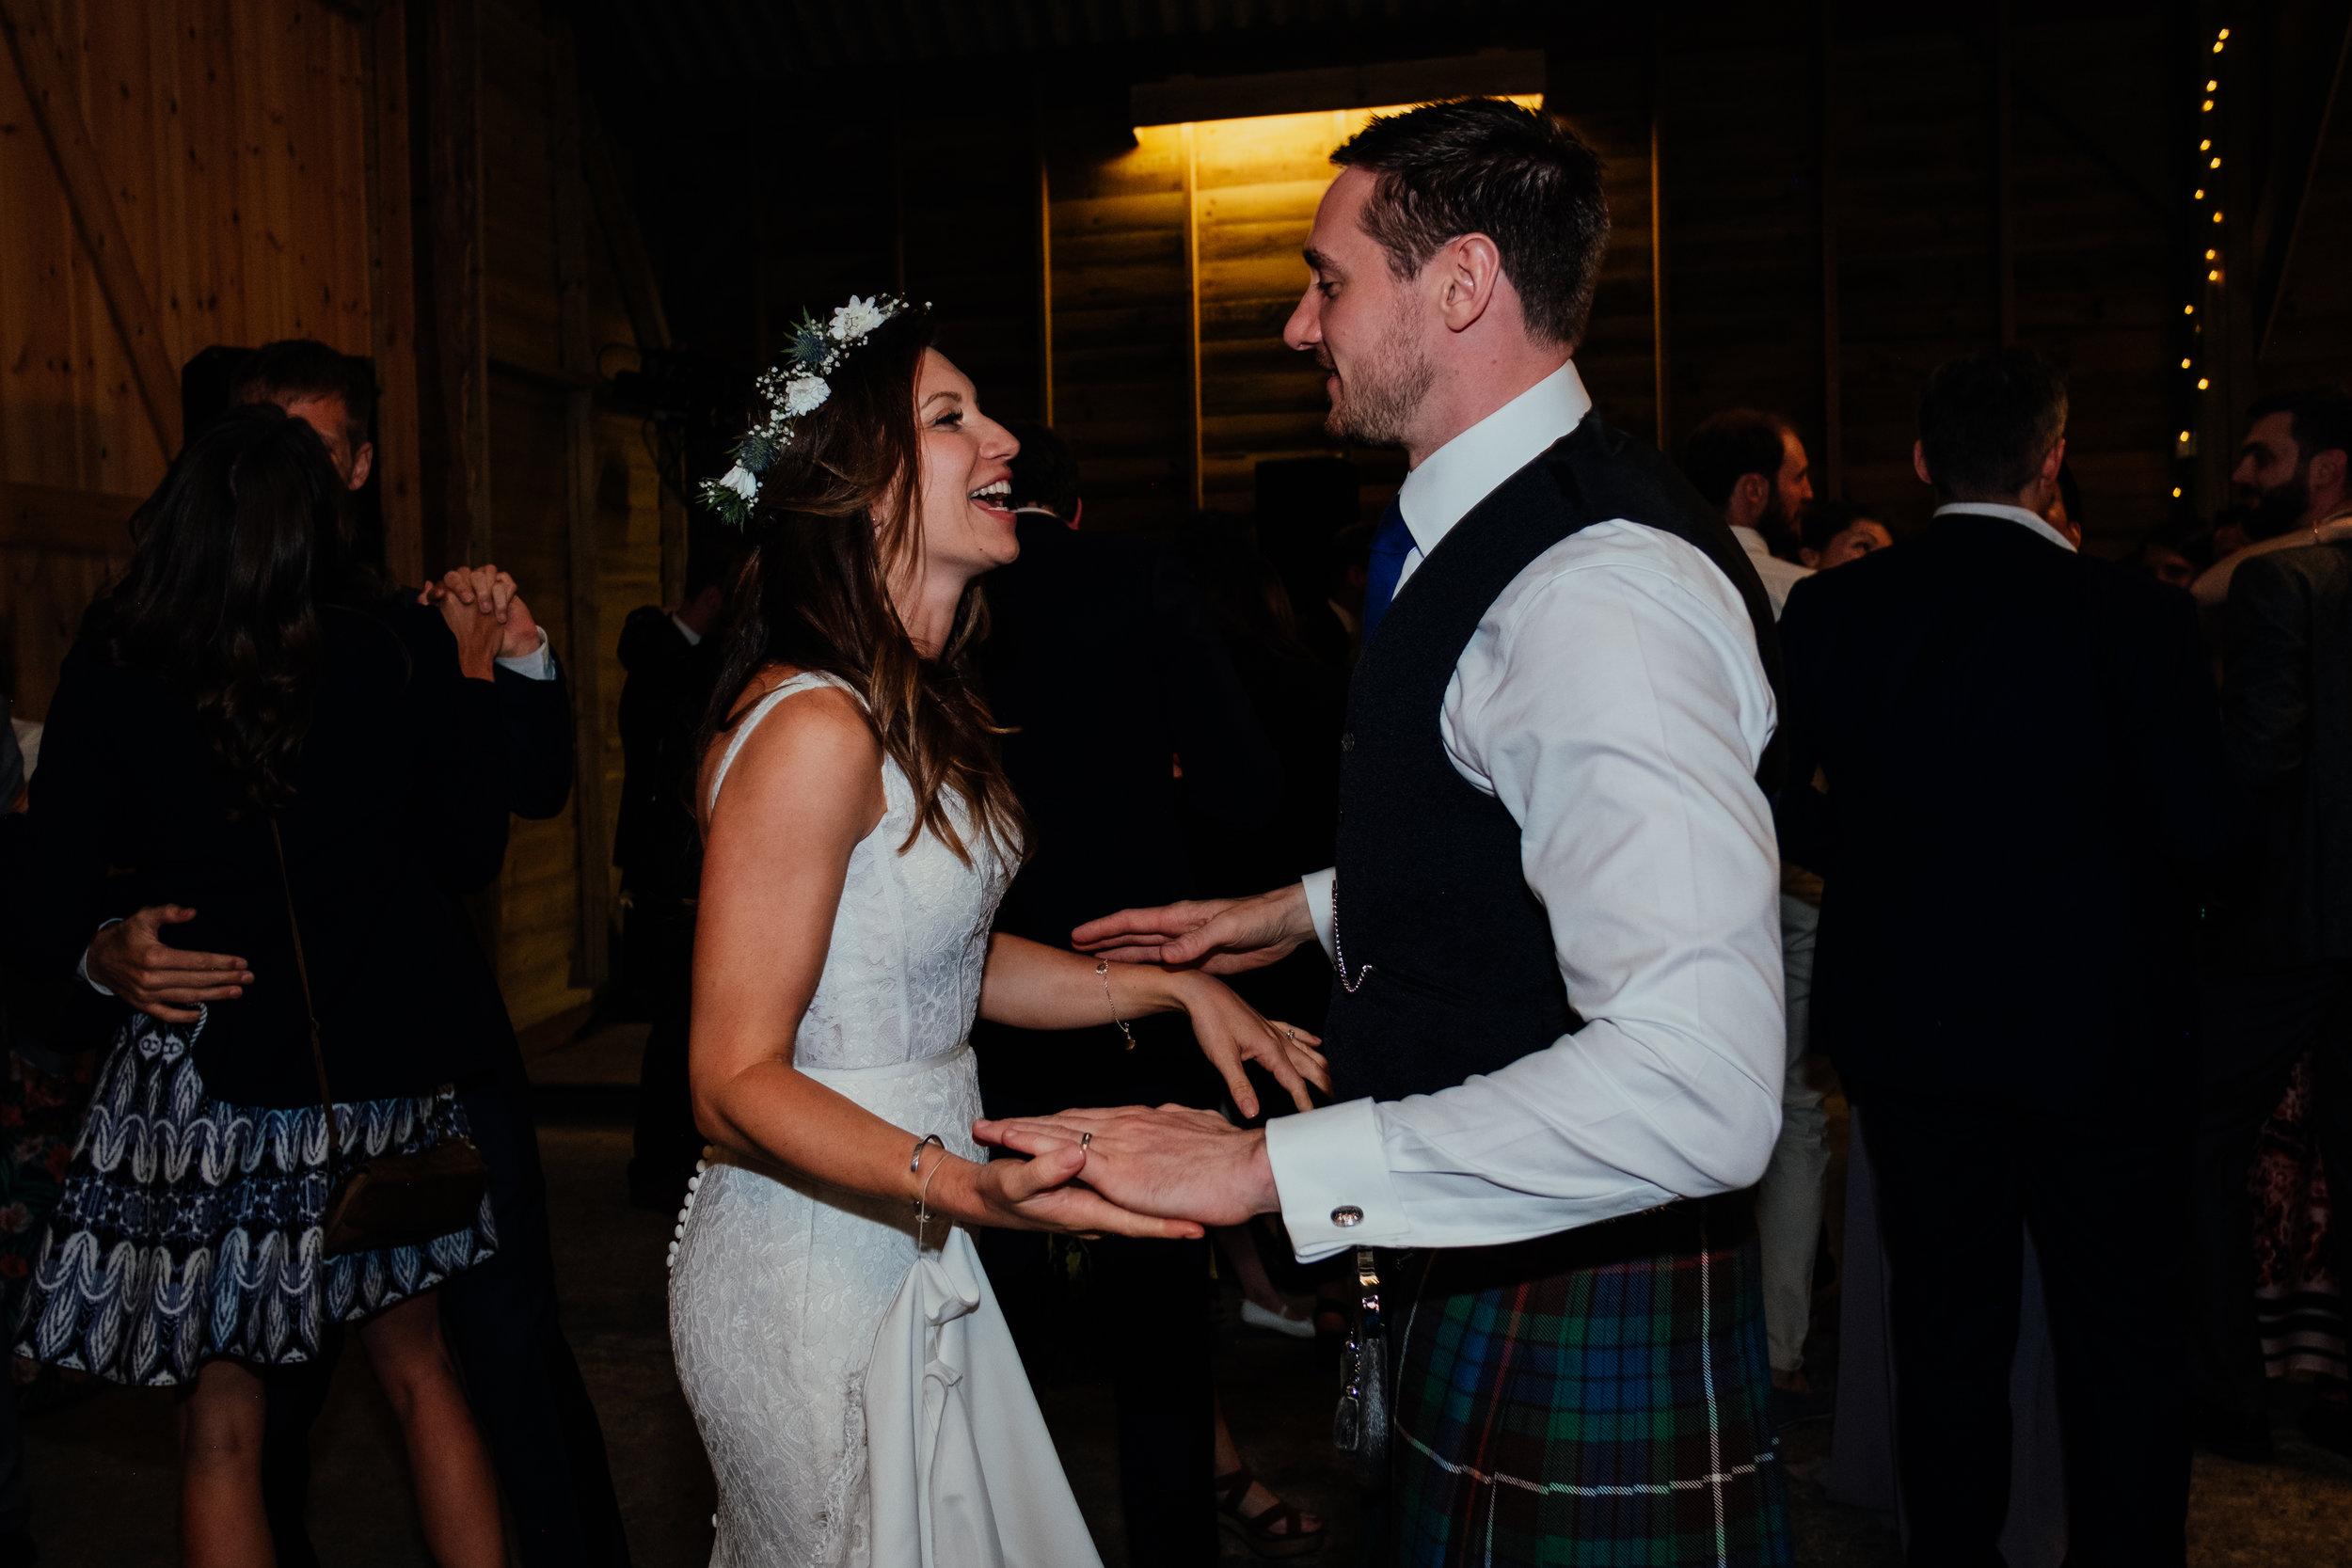 Bride and Groom dancing at Captains Wood Barn wedding